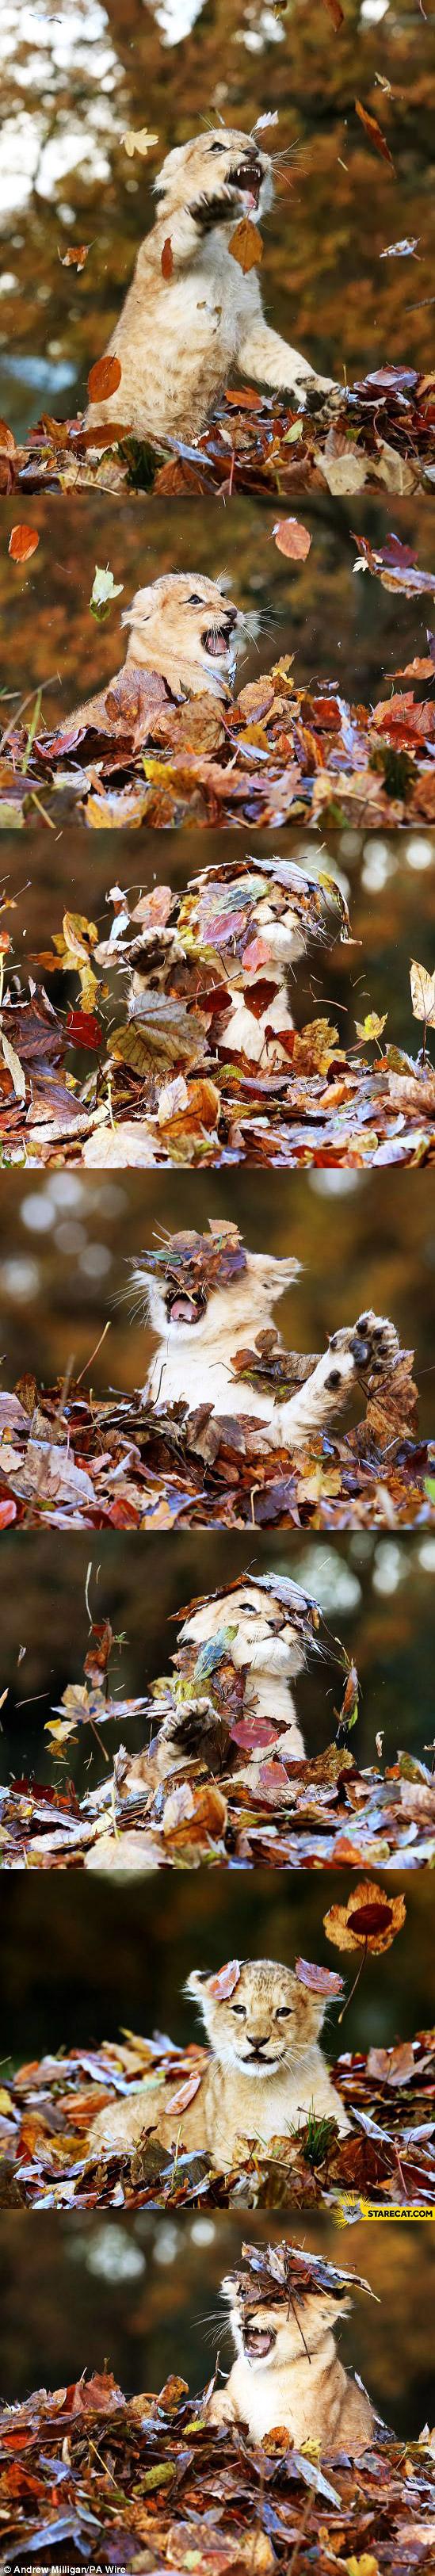 Cute dangerous tiger